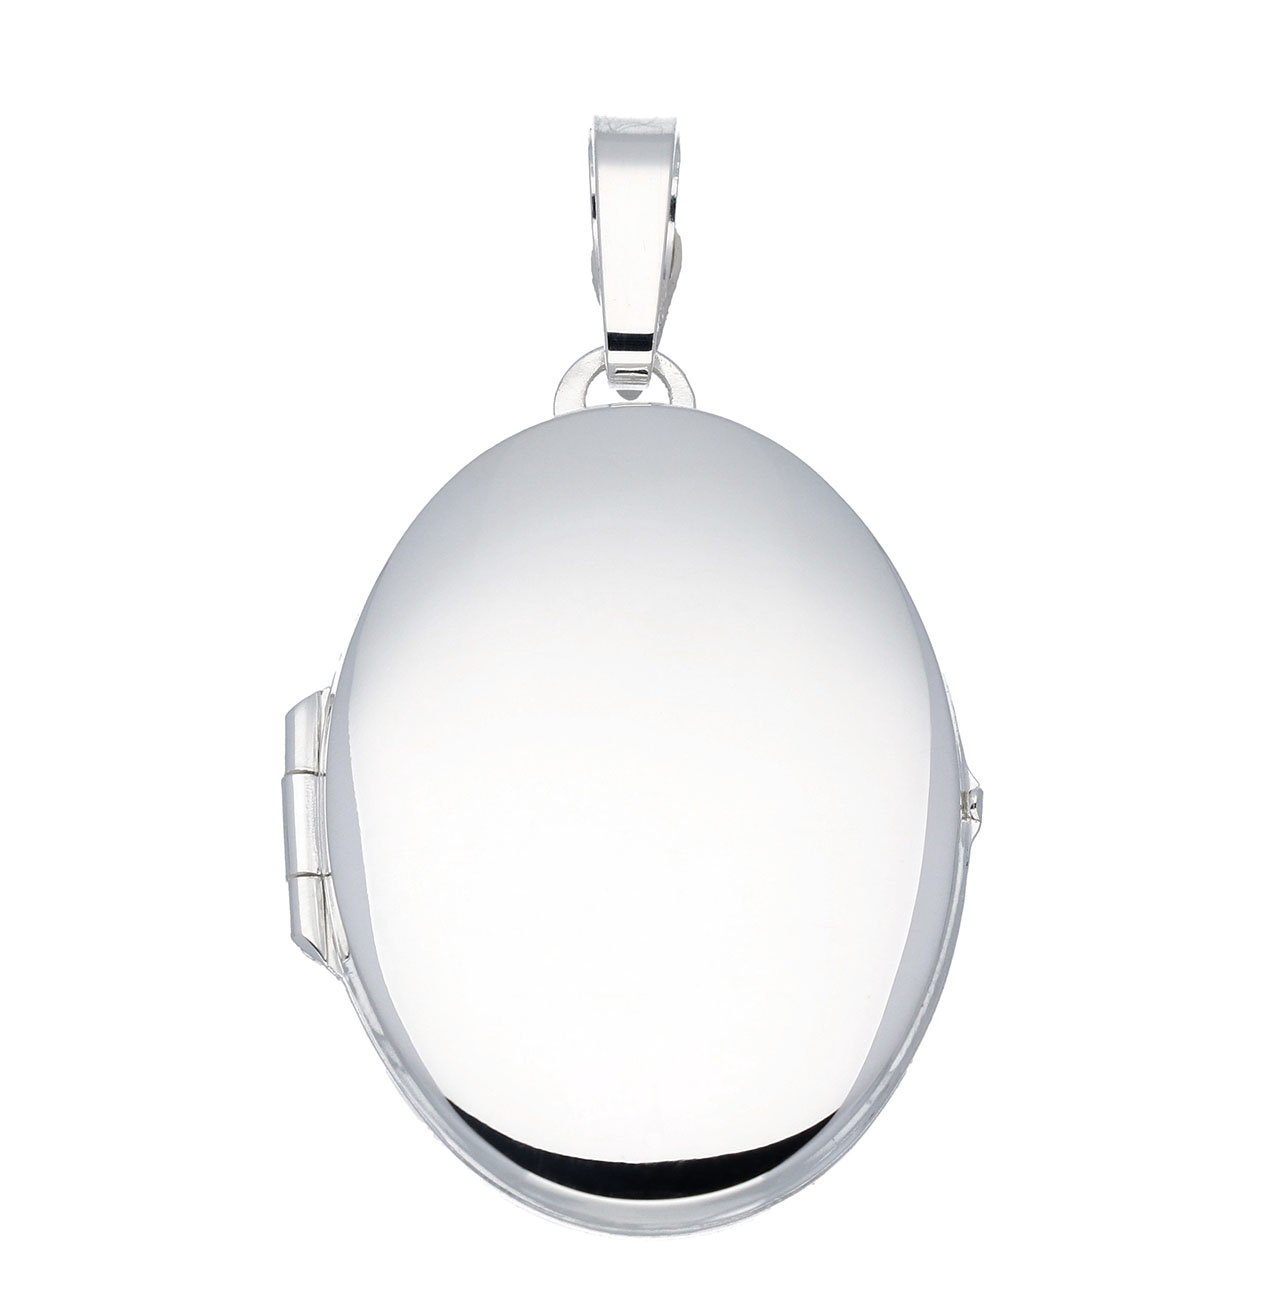 Zilveren Medaillon Ovaal - Glad - 24 x 34 mm 145.0010.00